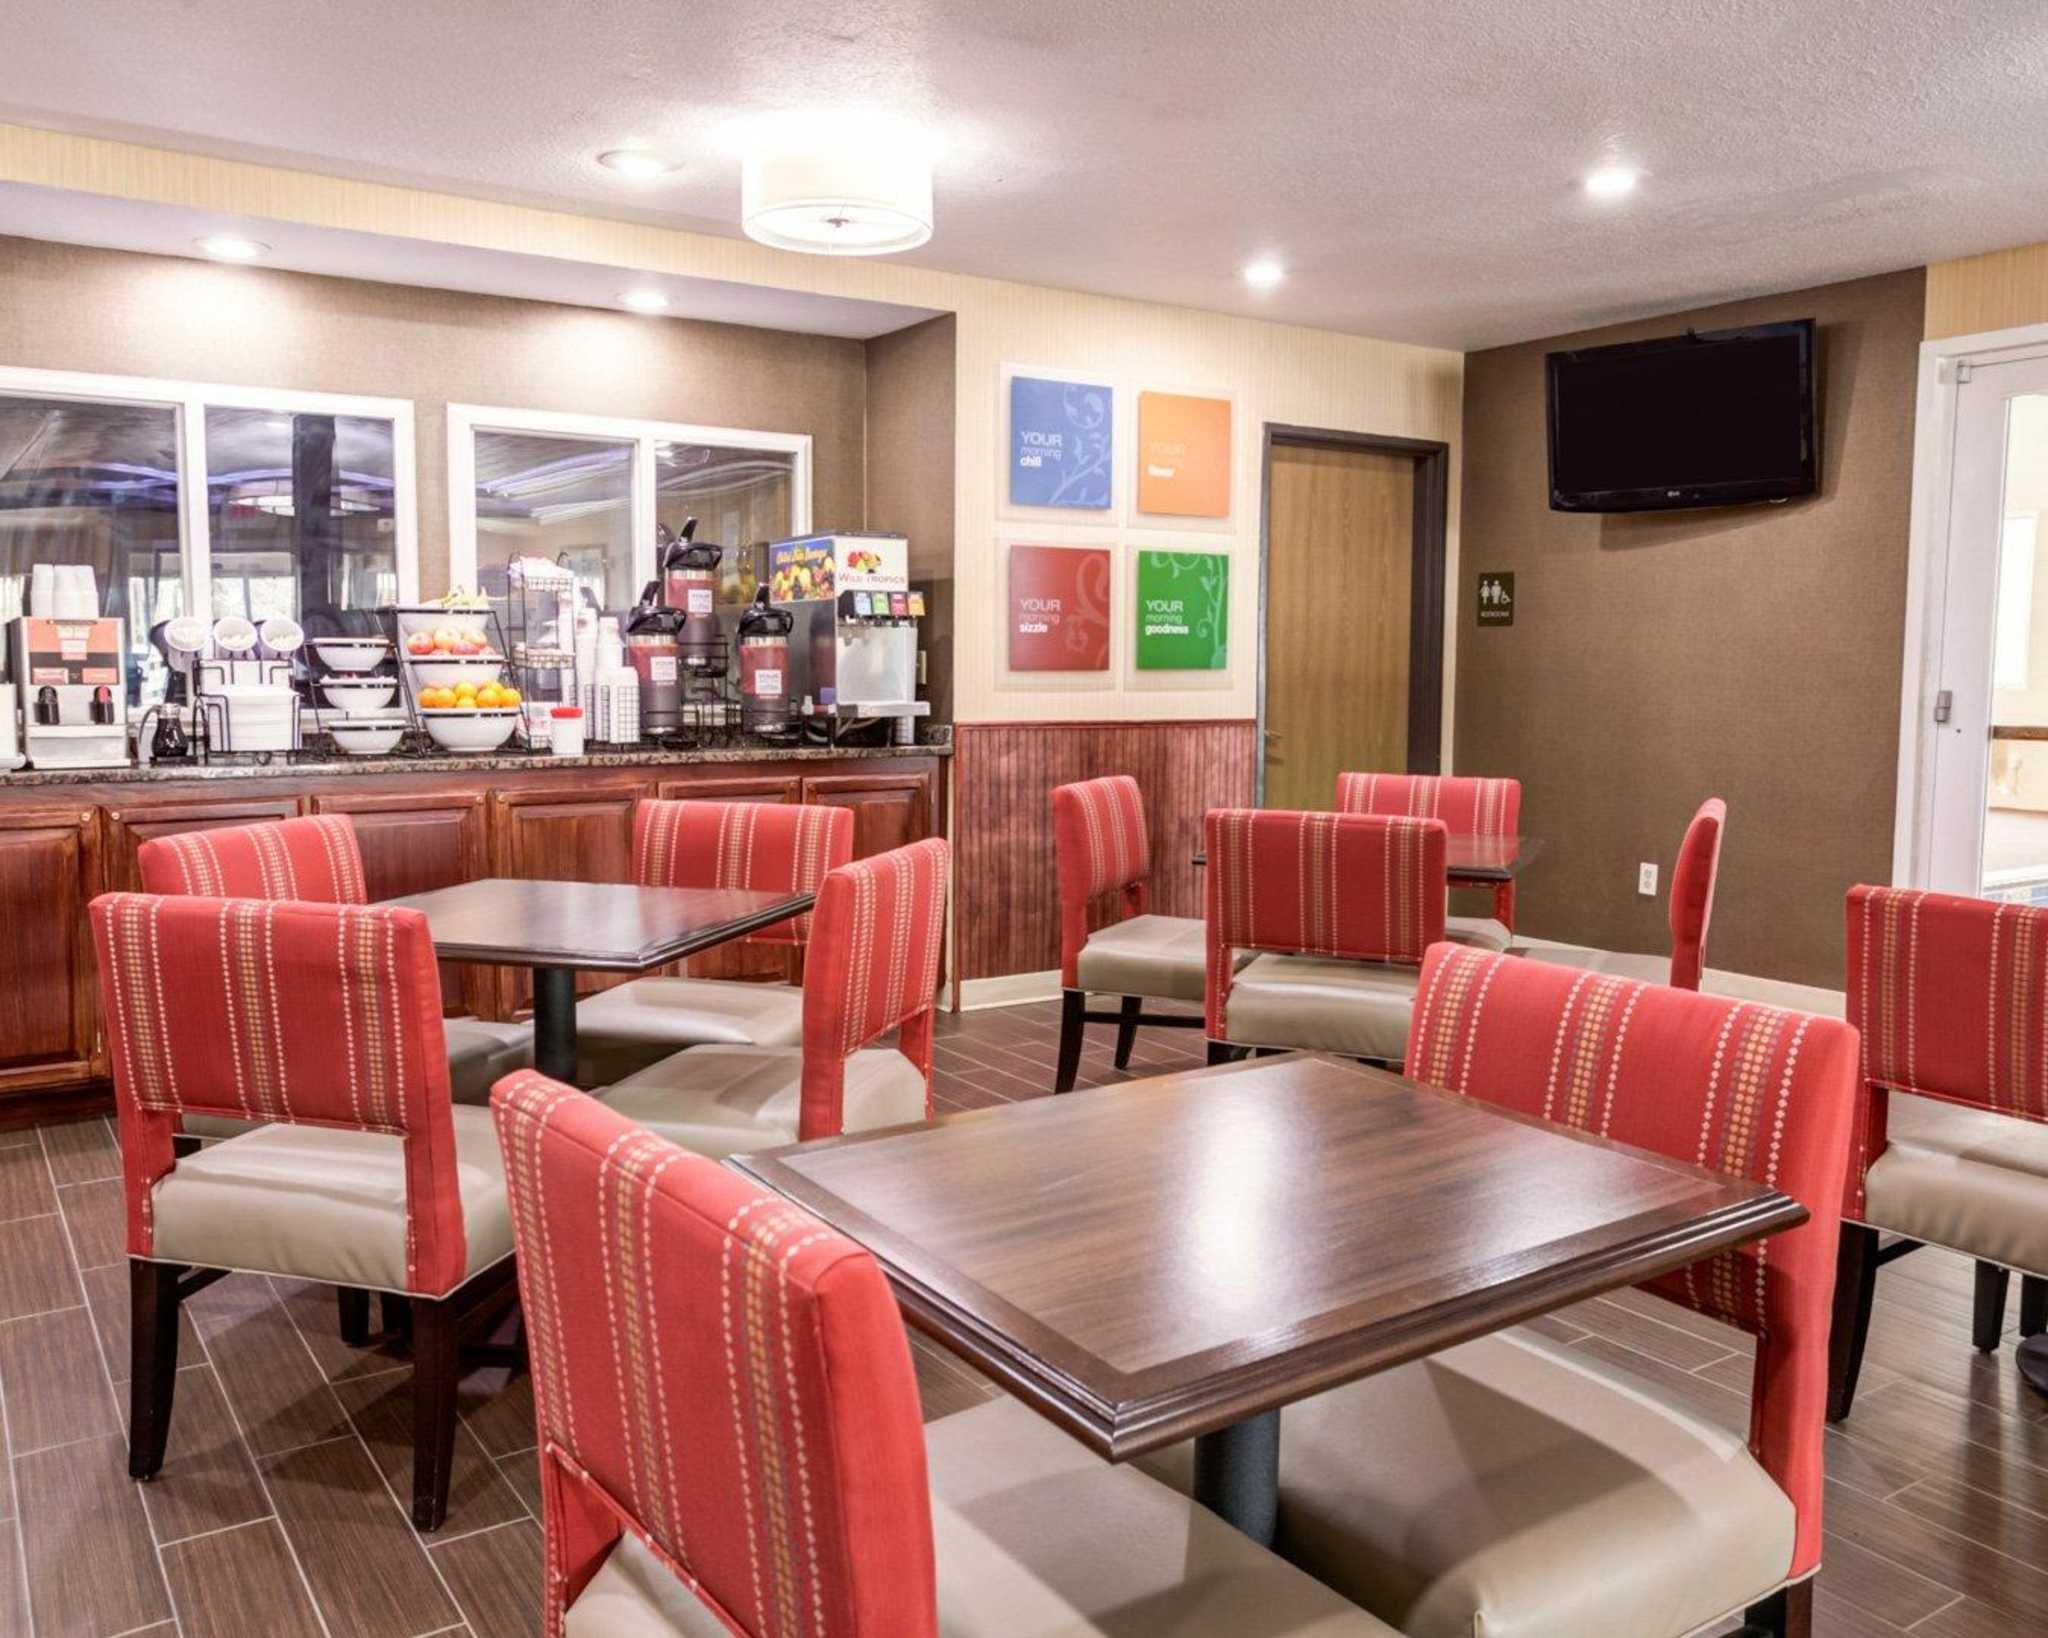 Comfort Inn Kearney - Liberty image 17